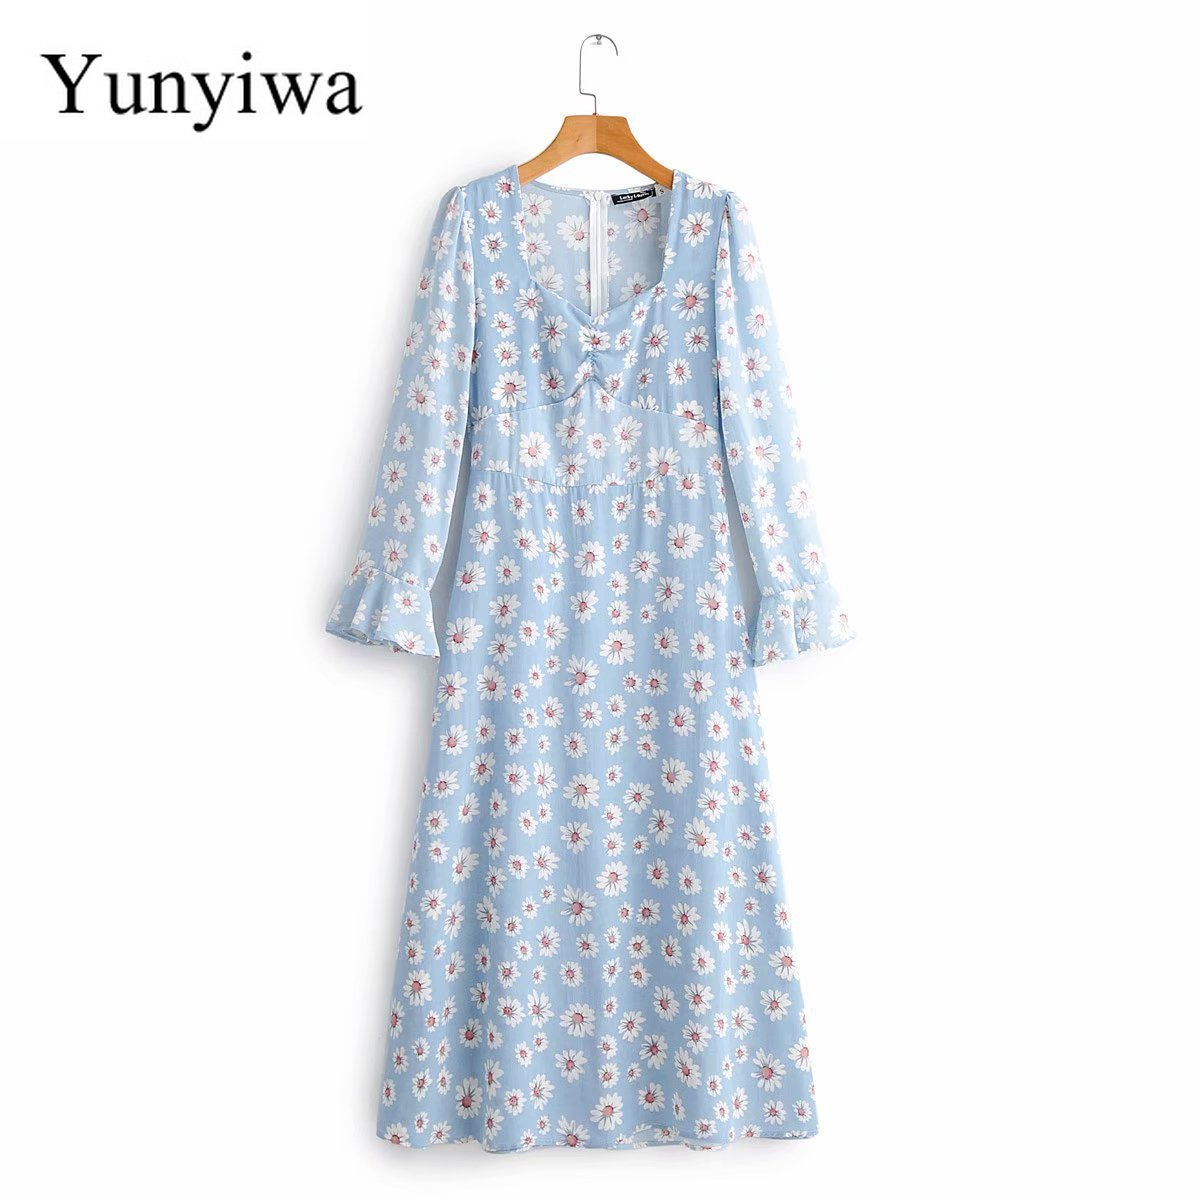 2020 Long Sleeve Printed Dress Casual Women Dresses Party Long Loose Maxi Dress Elegant Vestidos